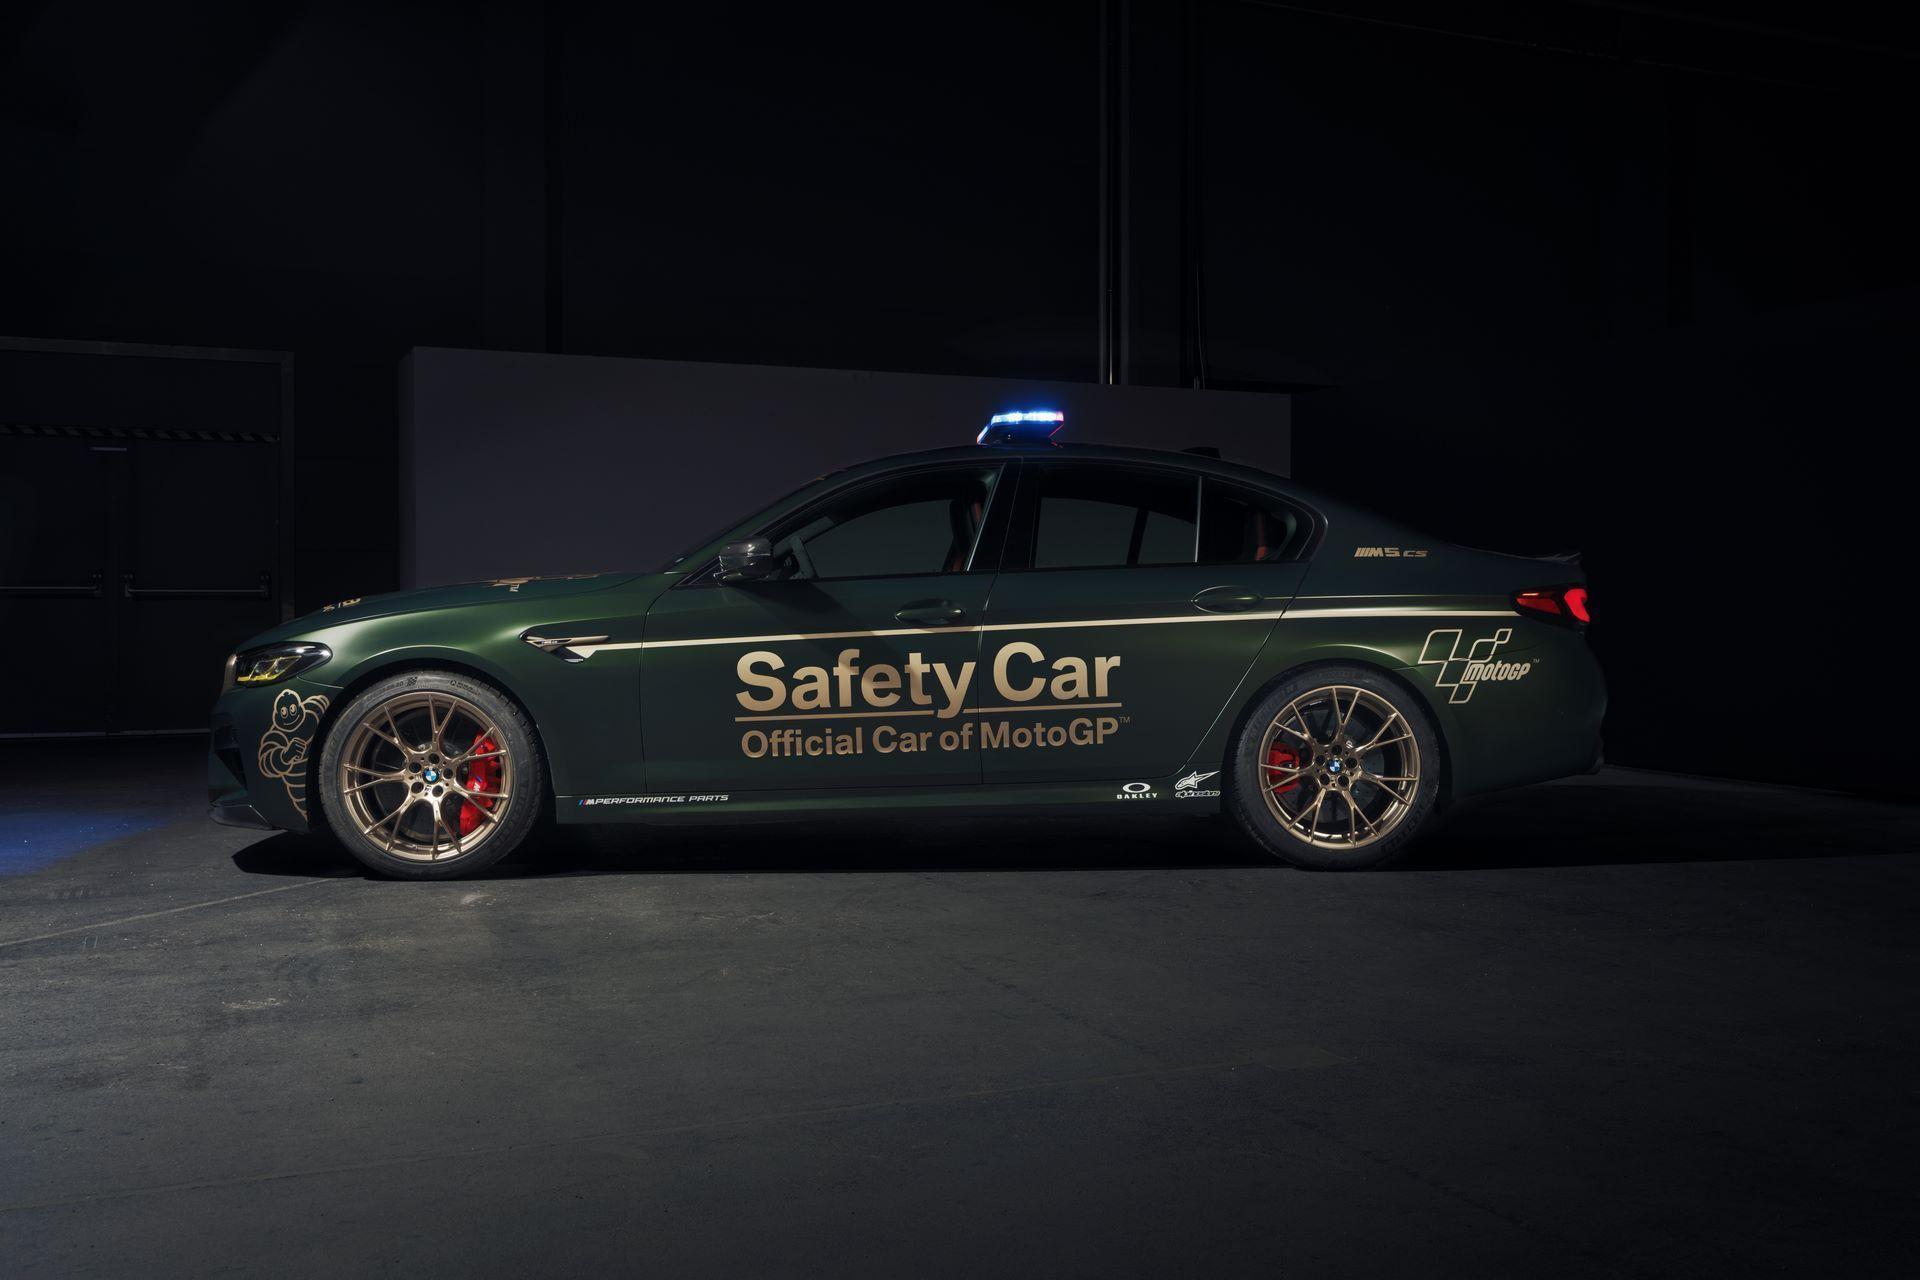 BMW-M3-M4-M5-CS-Safety-Cars-moto-gp-motogp-16